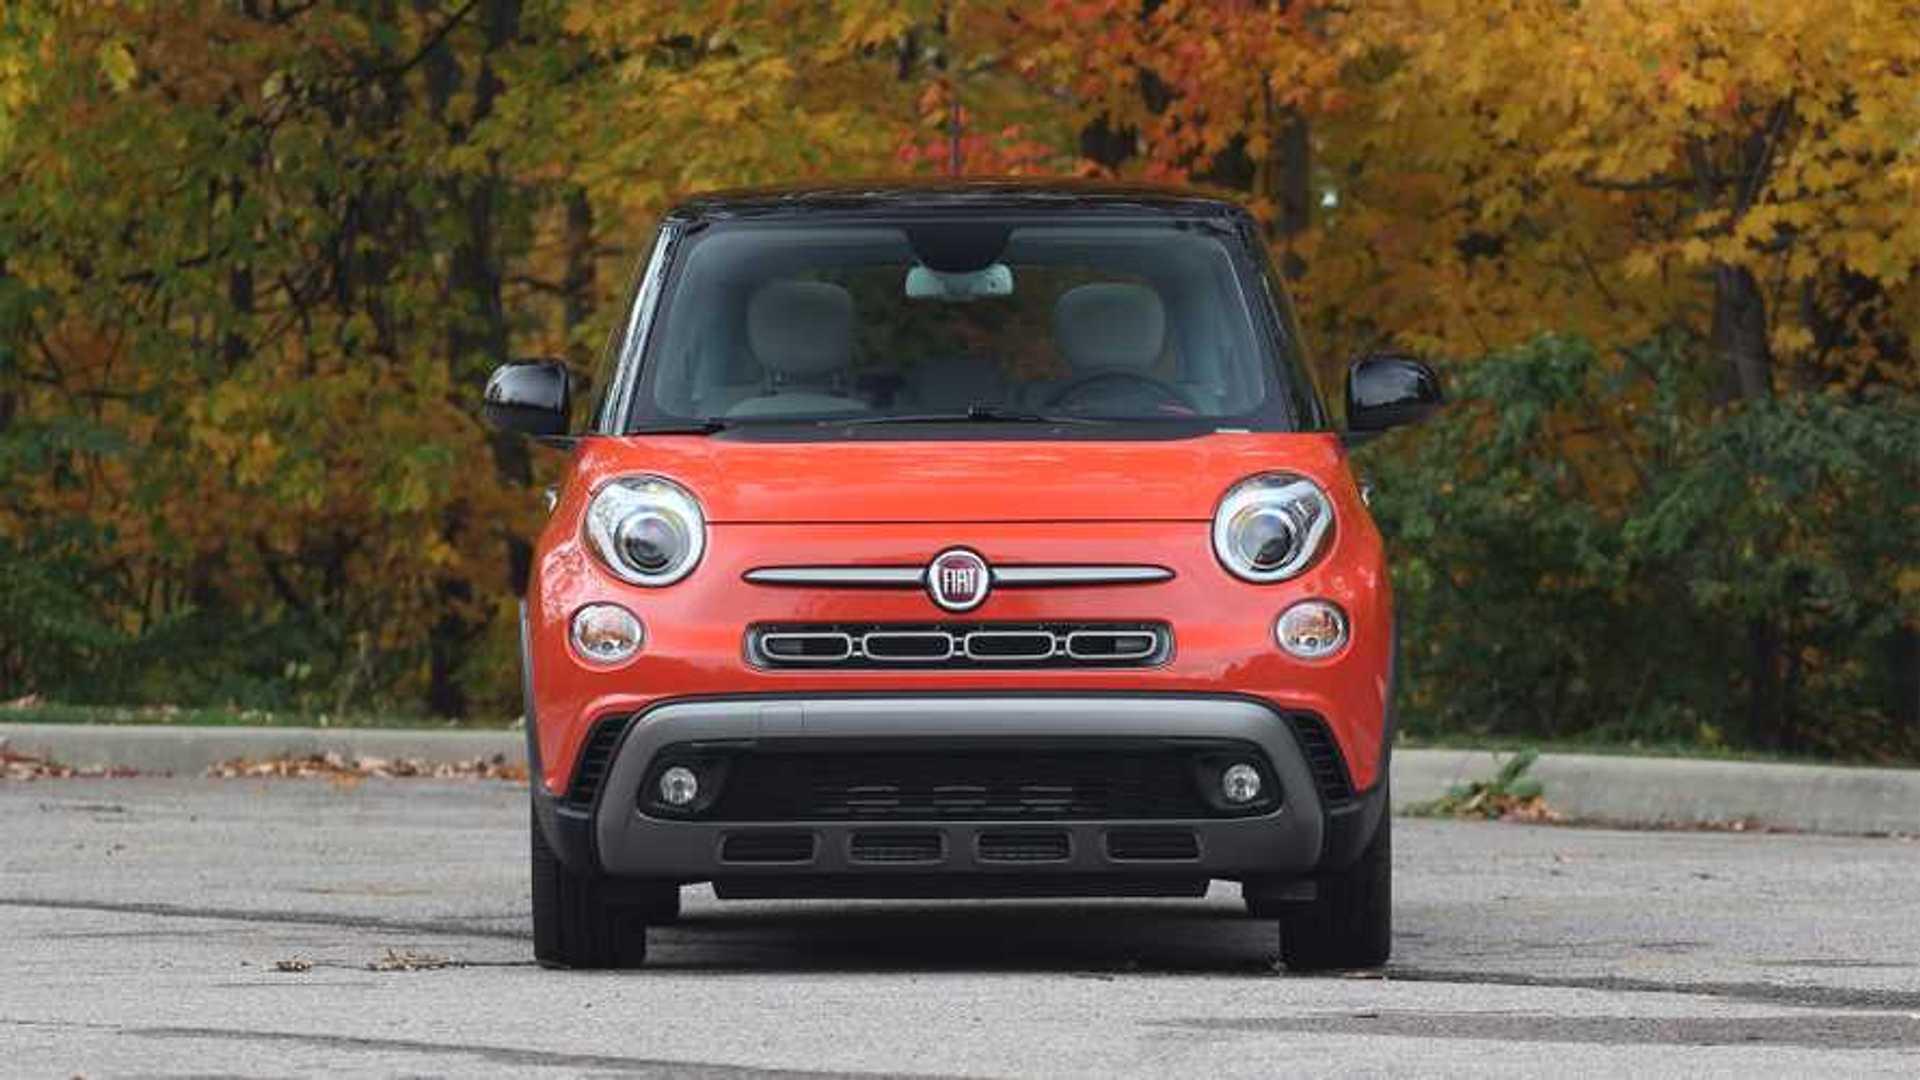 2019 Fiat 500L Trekking Review: The Great Pumpkin